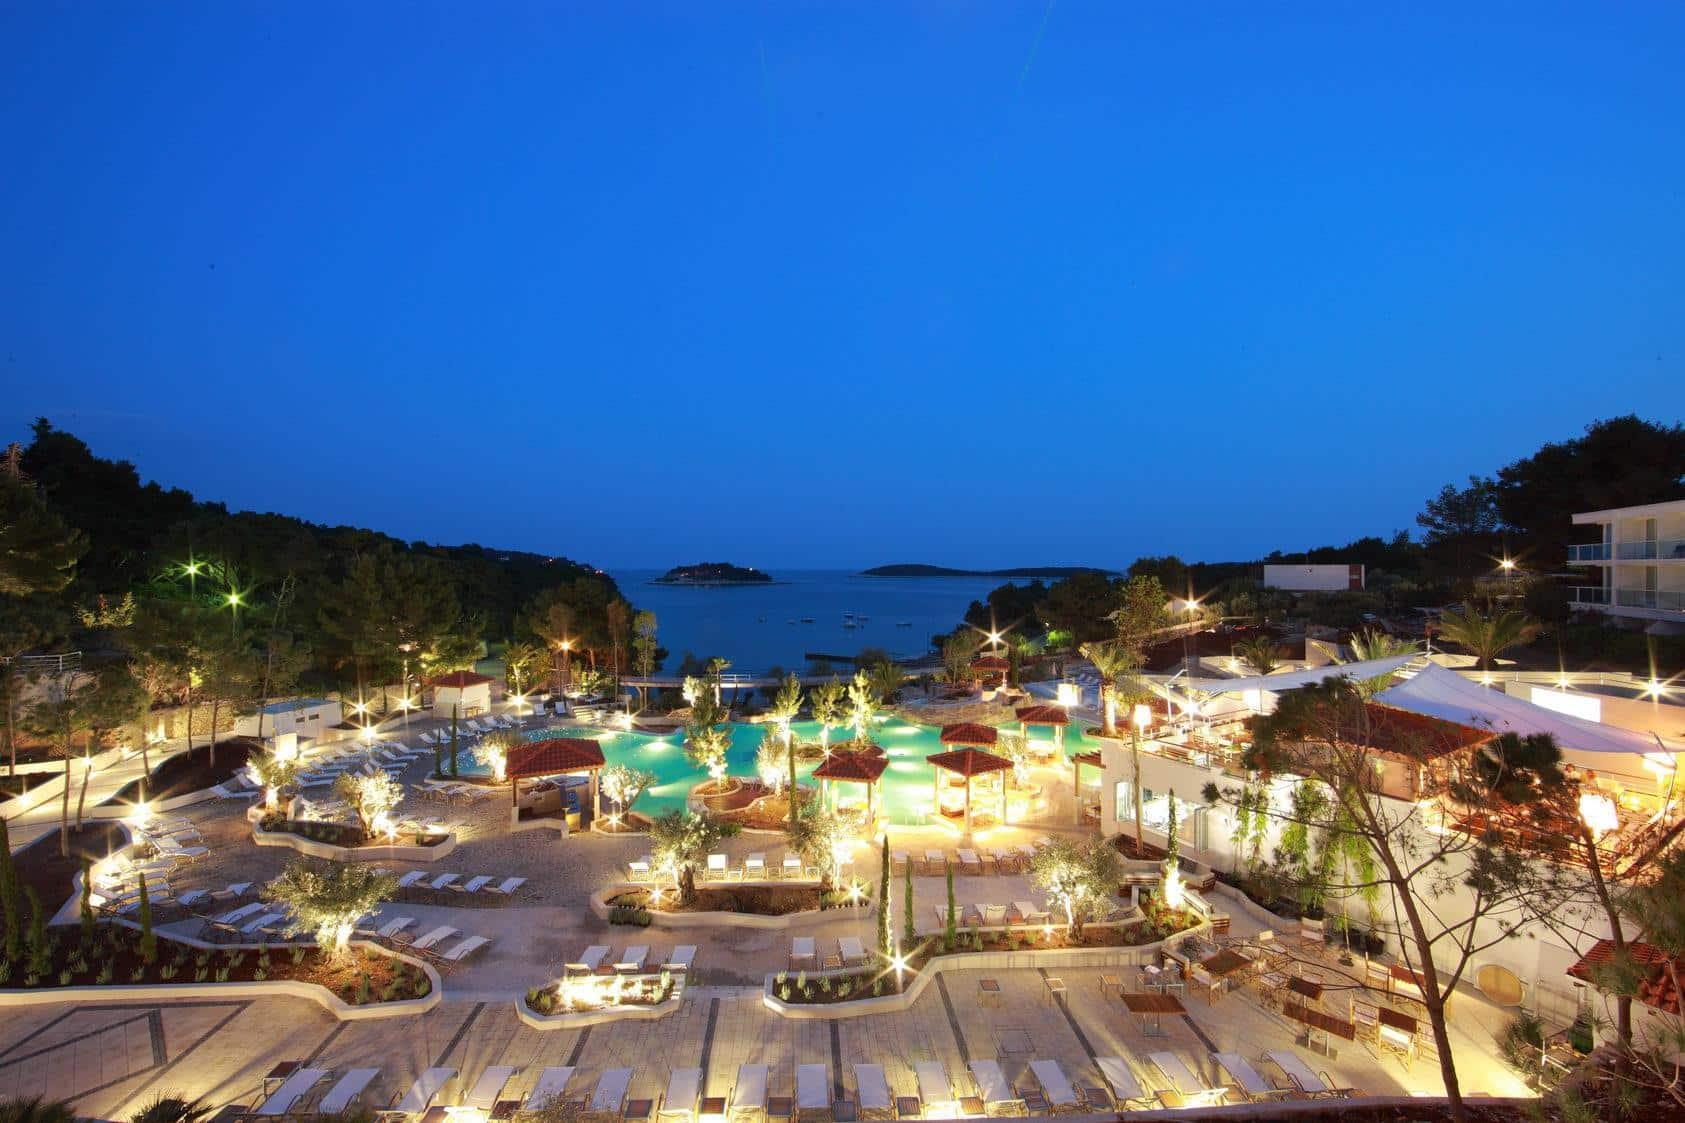 Amfora, Hvar grand beach resort 3